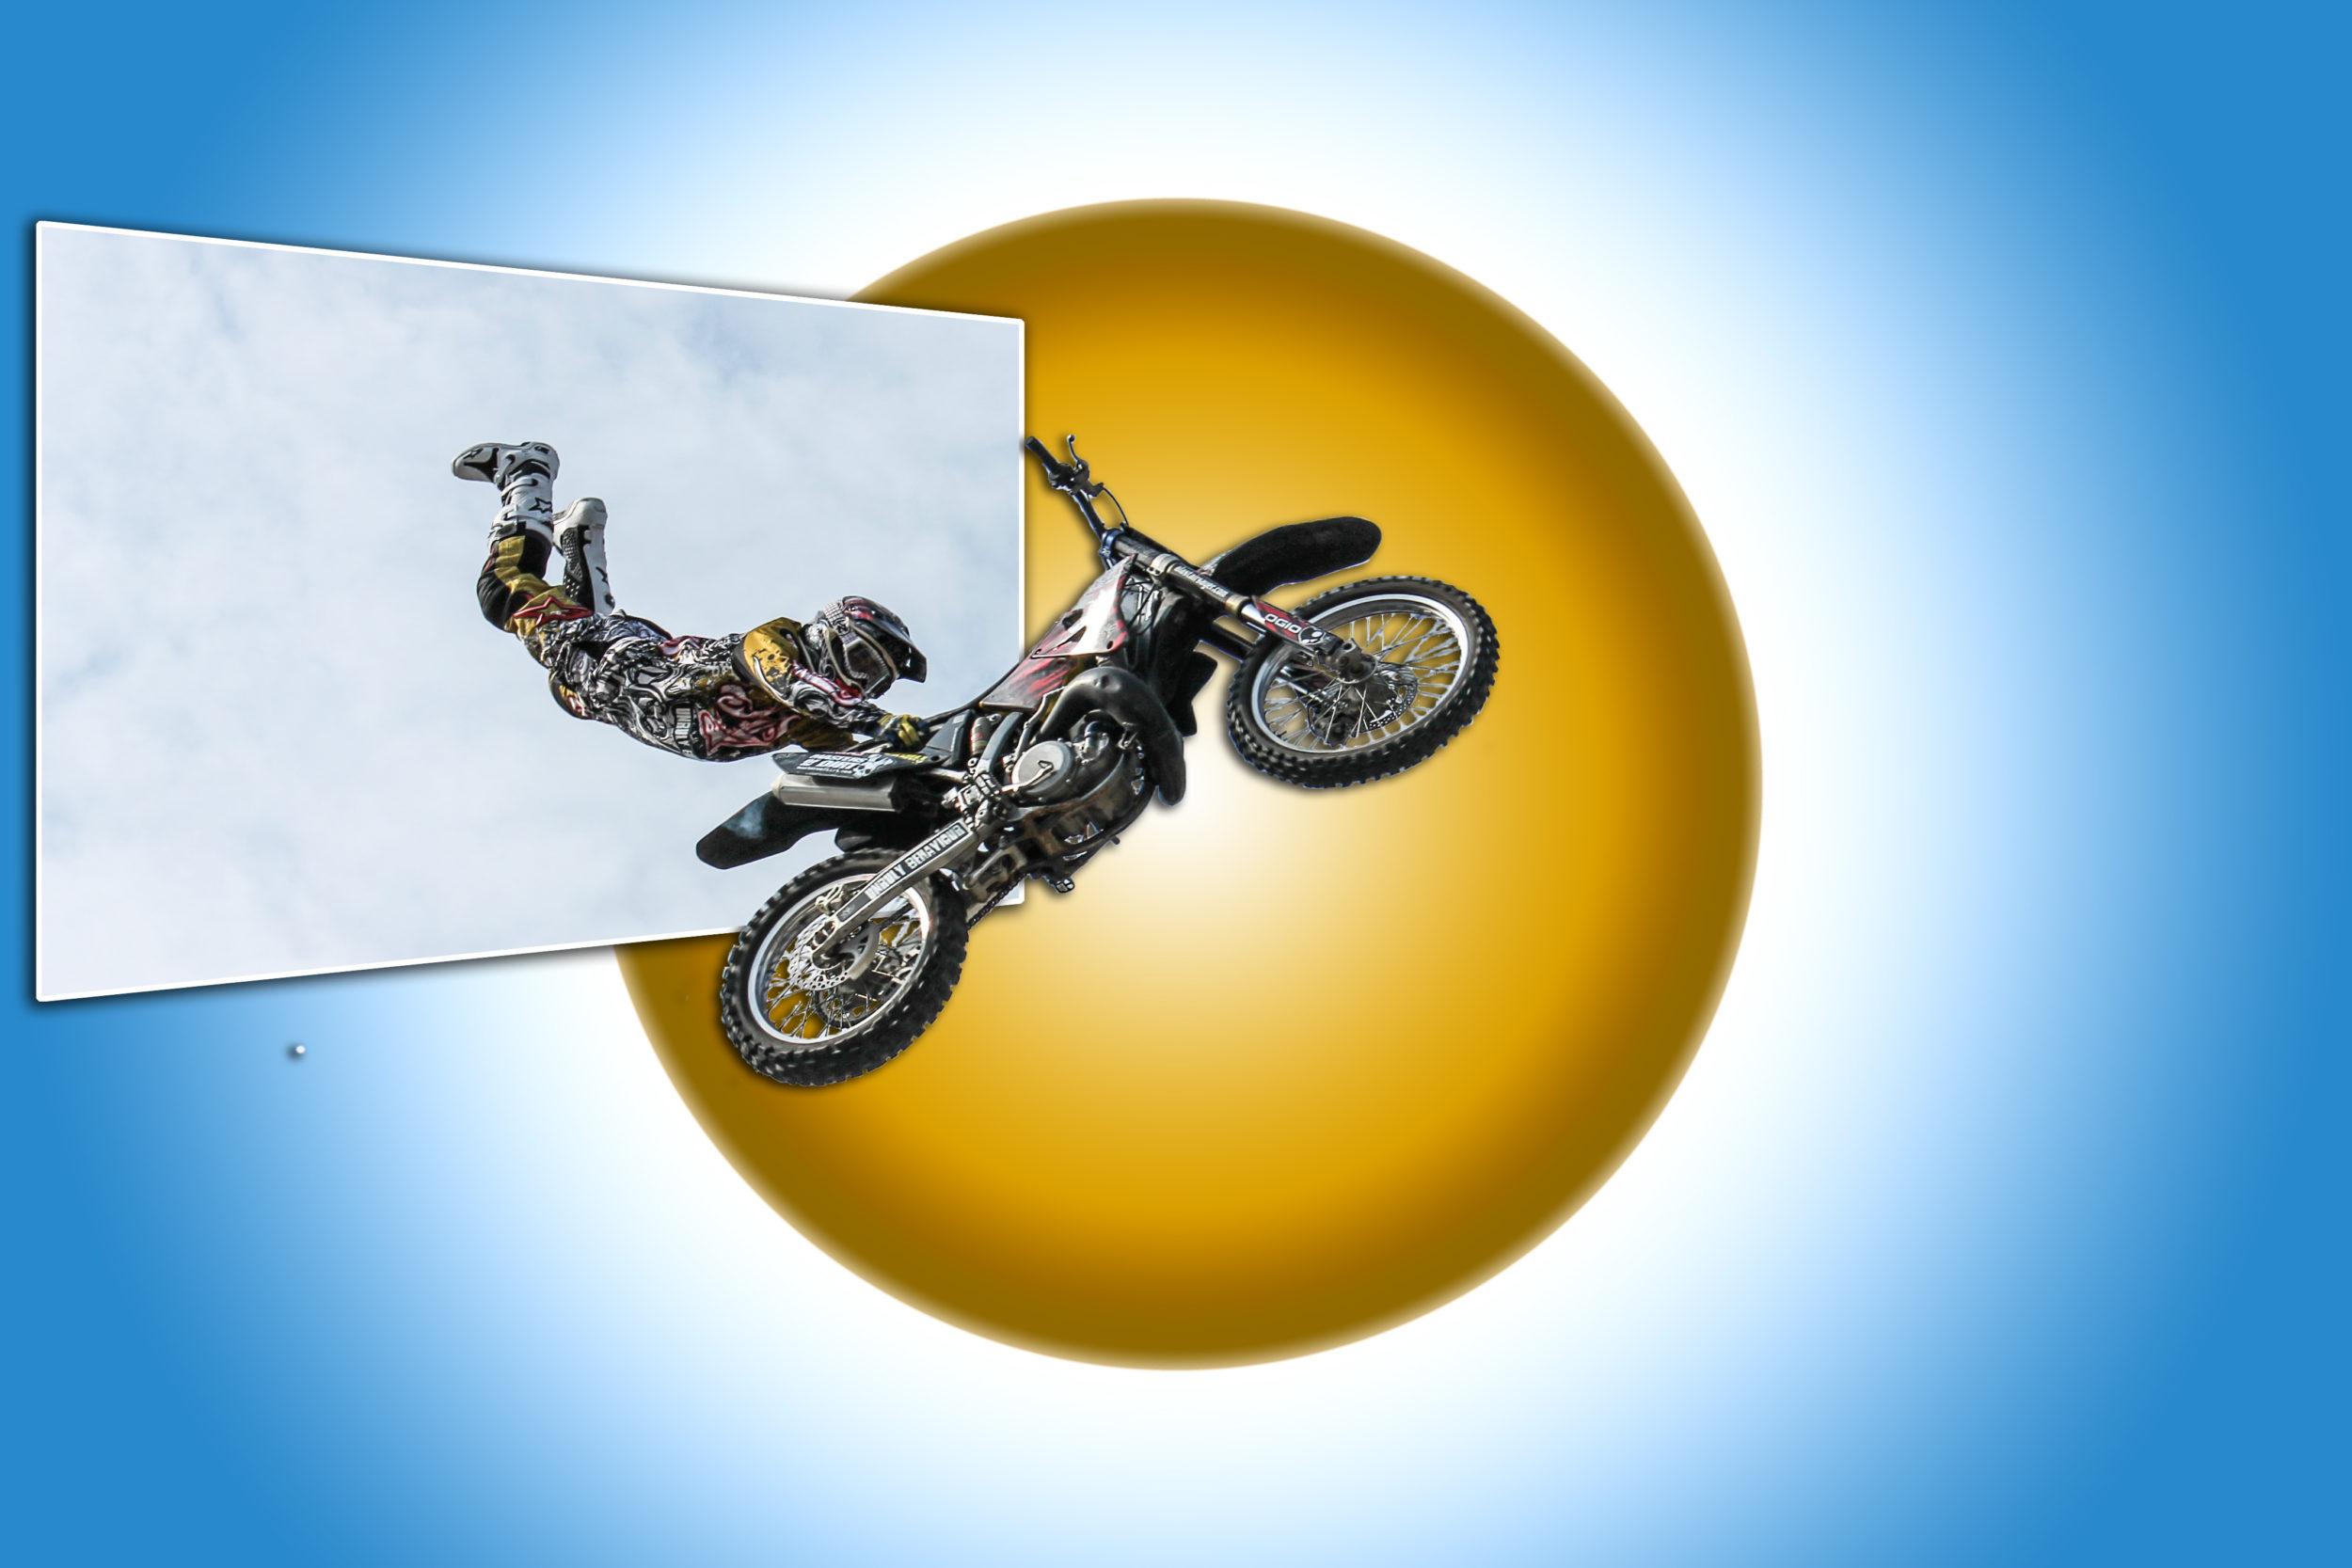 biker-384921 retouchée